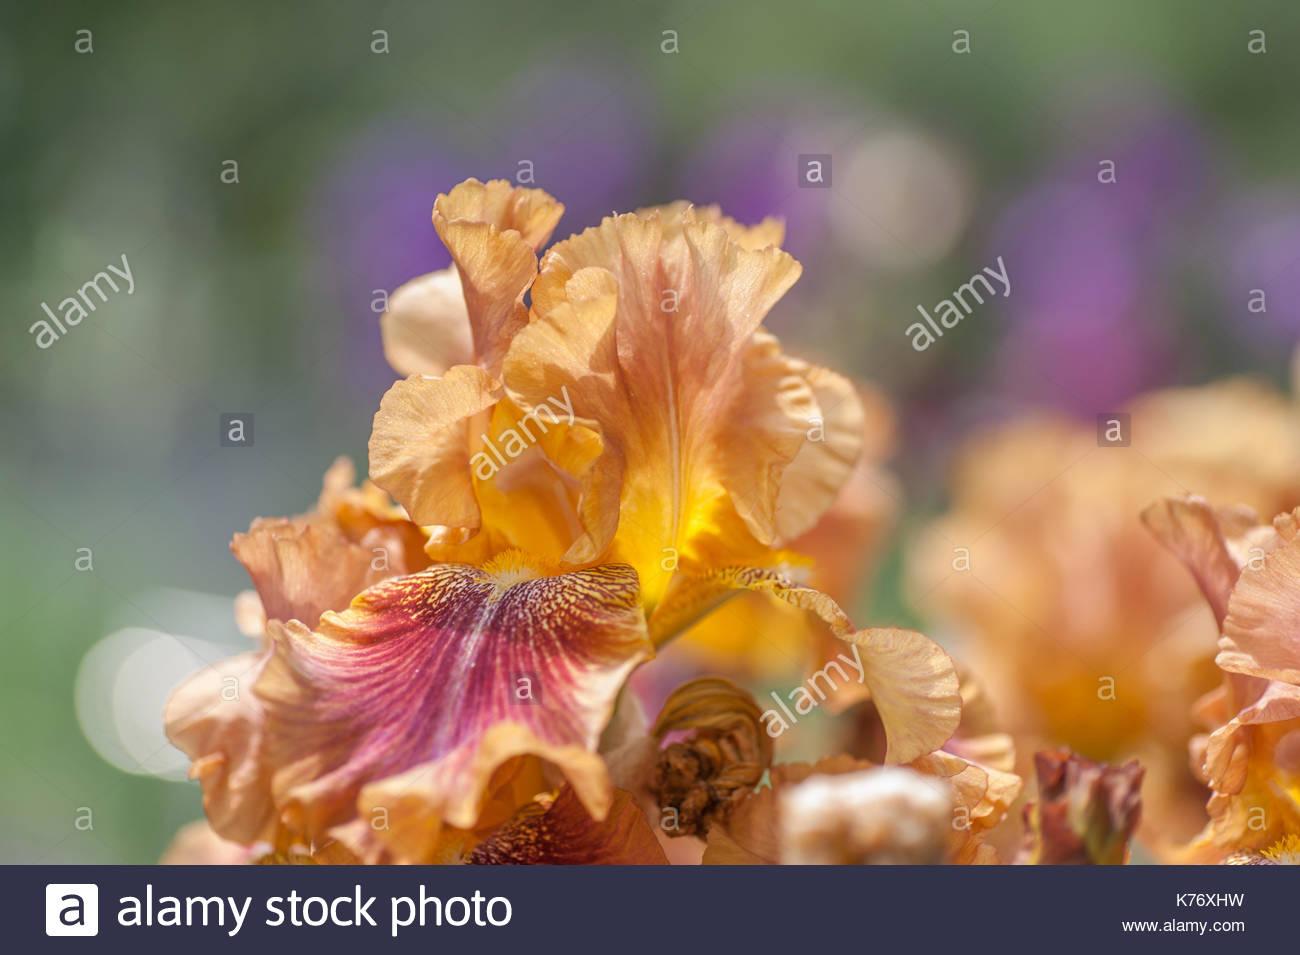 Tall Bearded Iris Autumn Leaves In Garden In Sunny Day Flower Stock